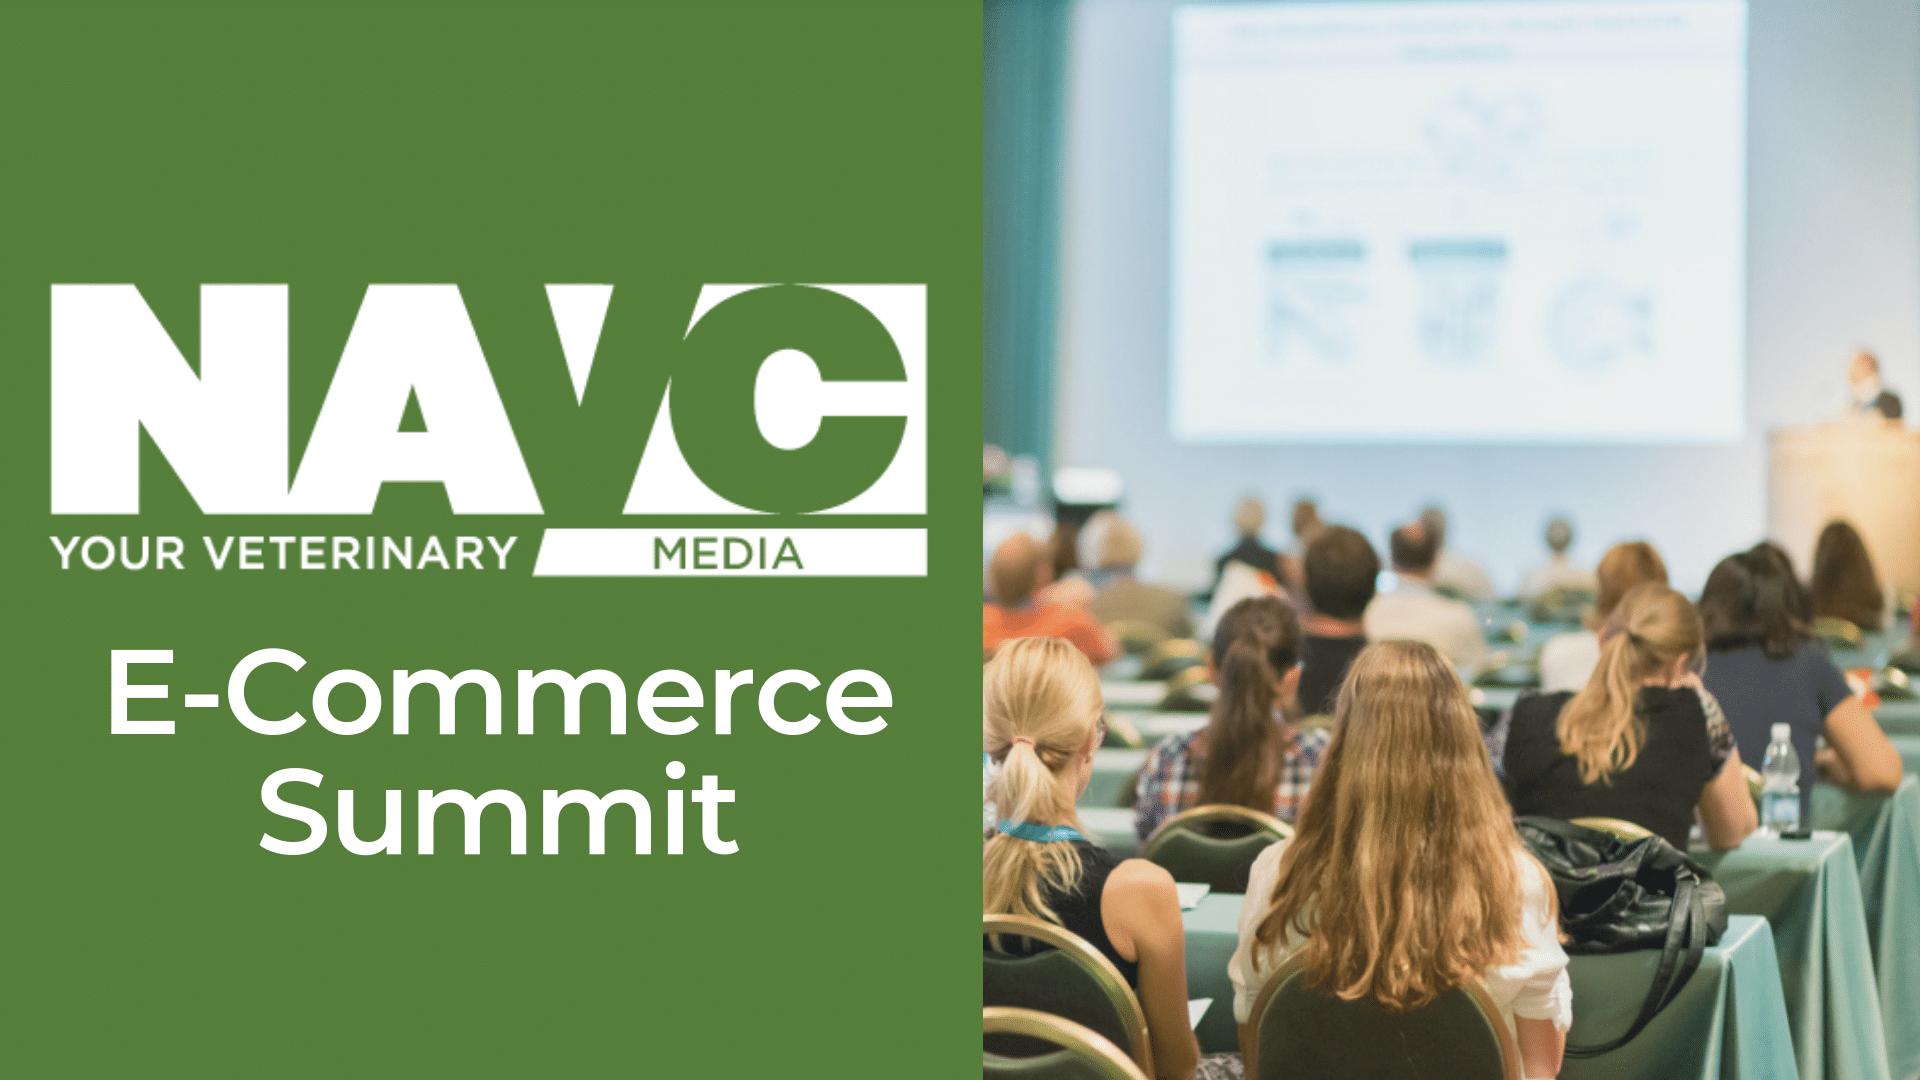 NAVC Media E-Commerce Summit - Today's Veterinary Business